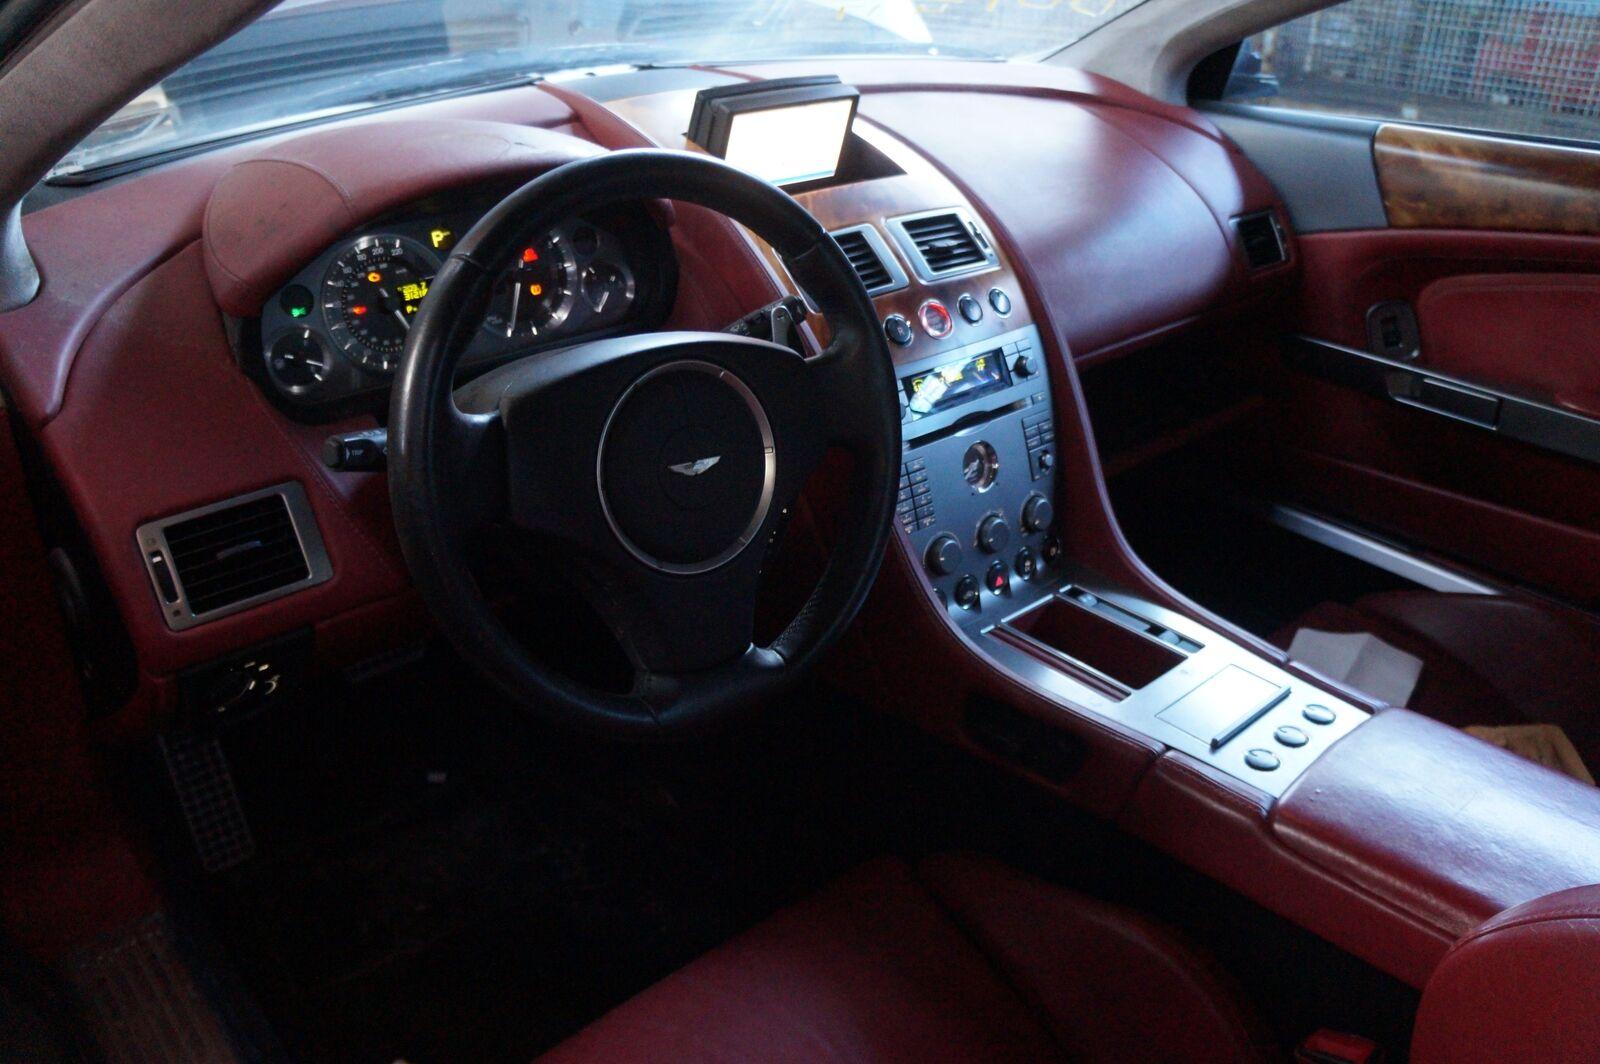 Cabin Distribution Fuse Box Body Control Modul 4G43-14C272-AH Aston Martin  DB9